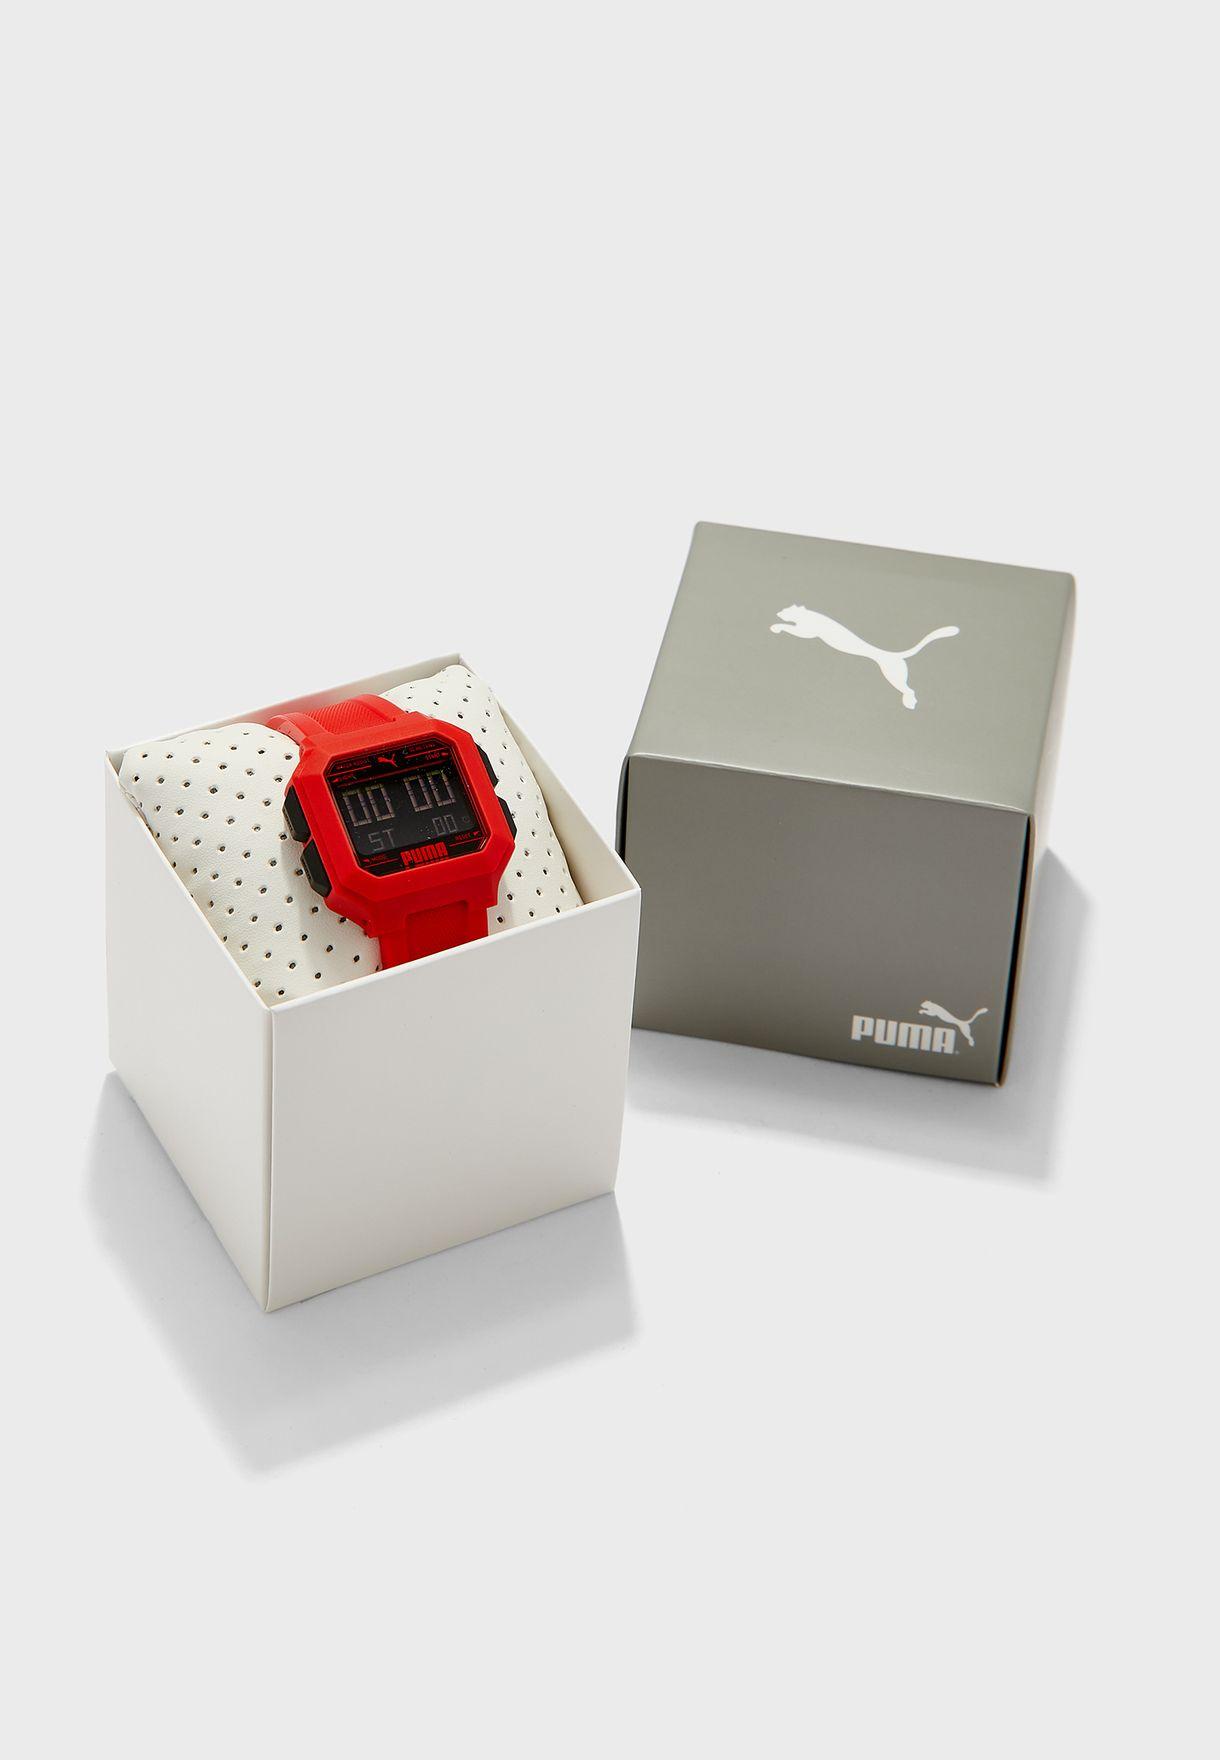 Remix Digital Watch